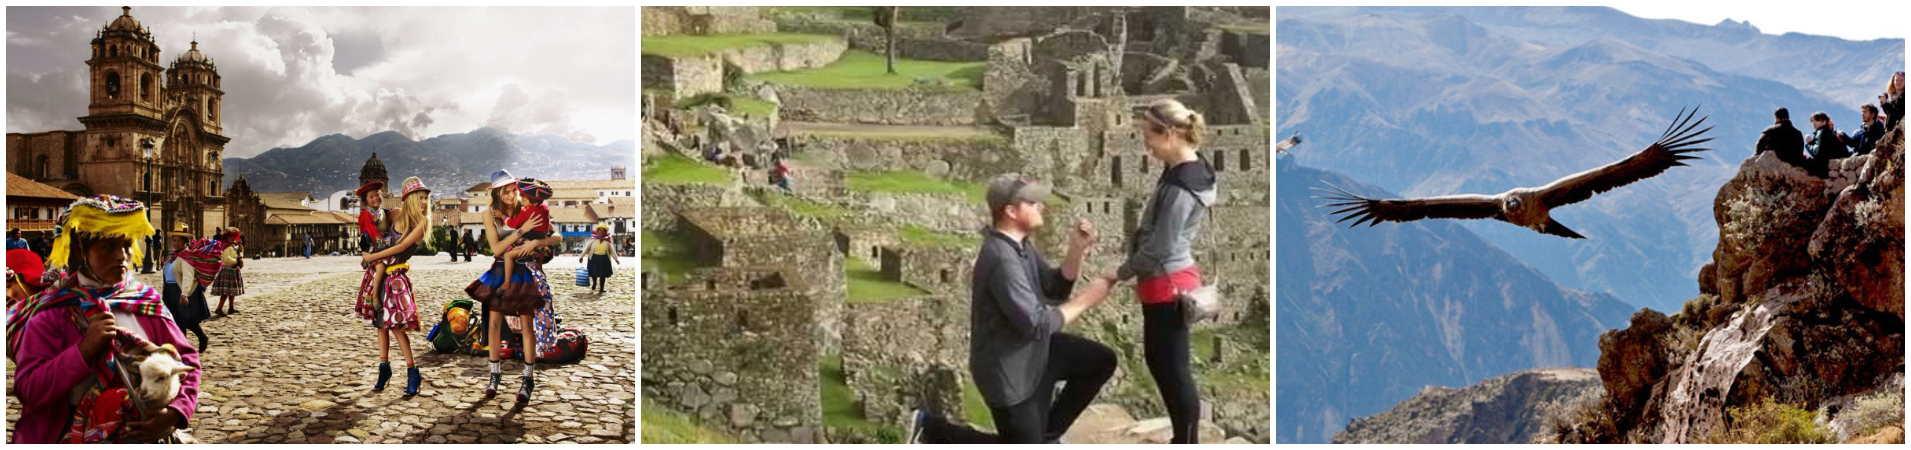 Viajes Cusco Machu Picchu Puno Arequipa 9 dias qori inka travel agency